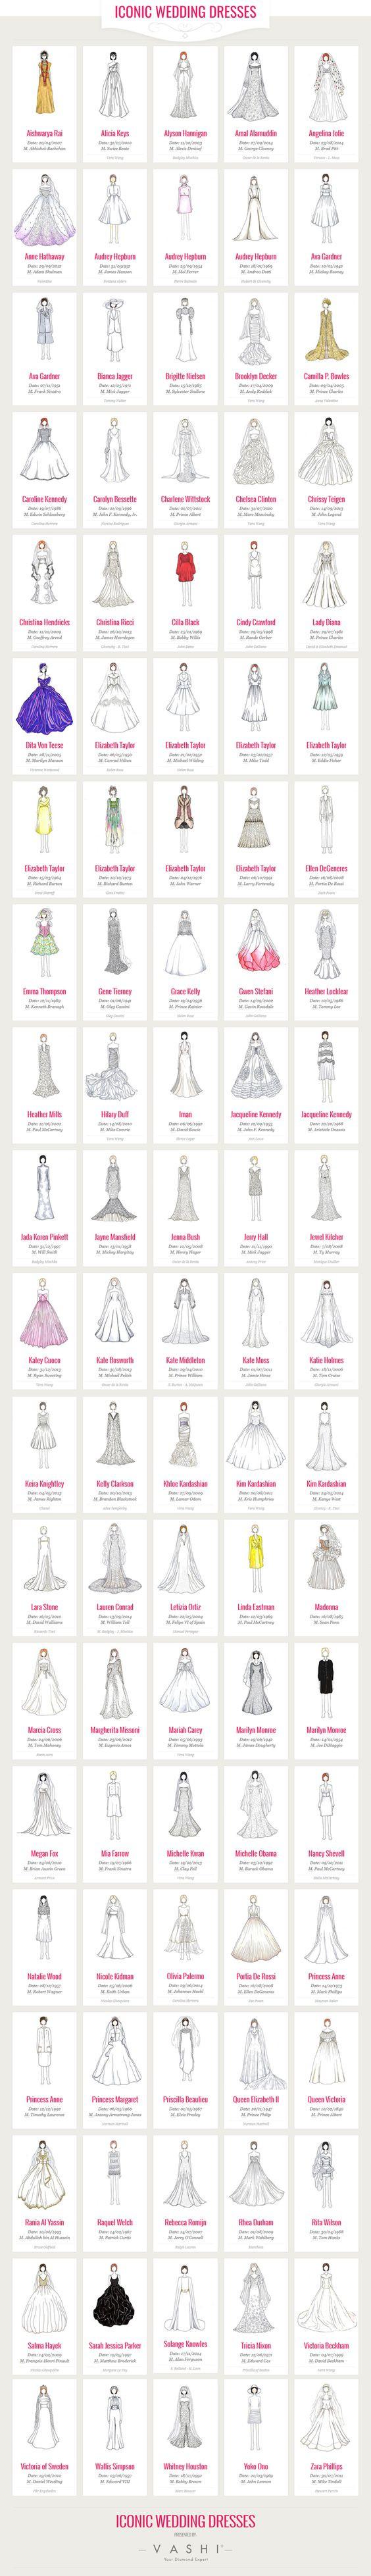 100 most iconic wedding dresses